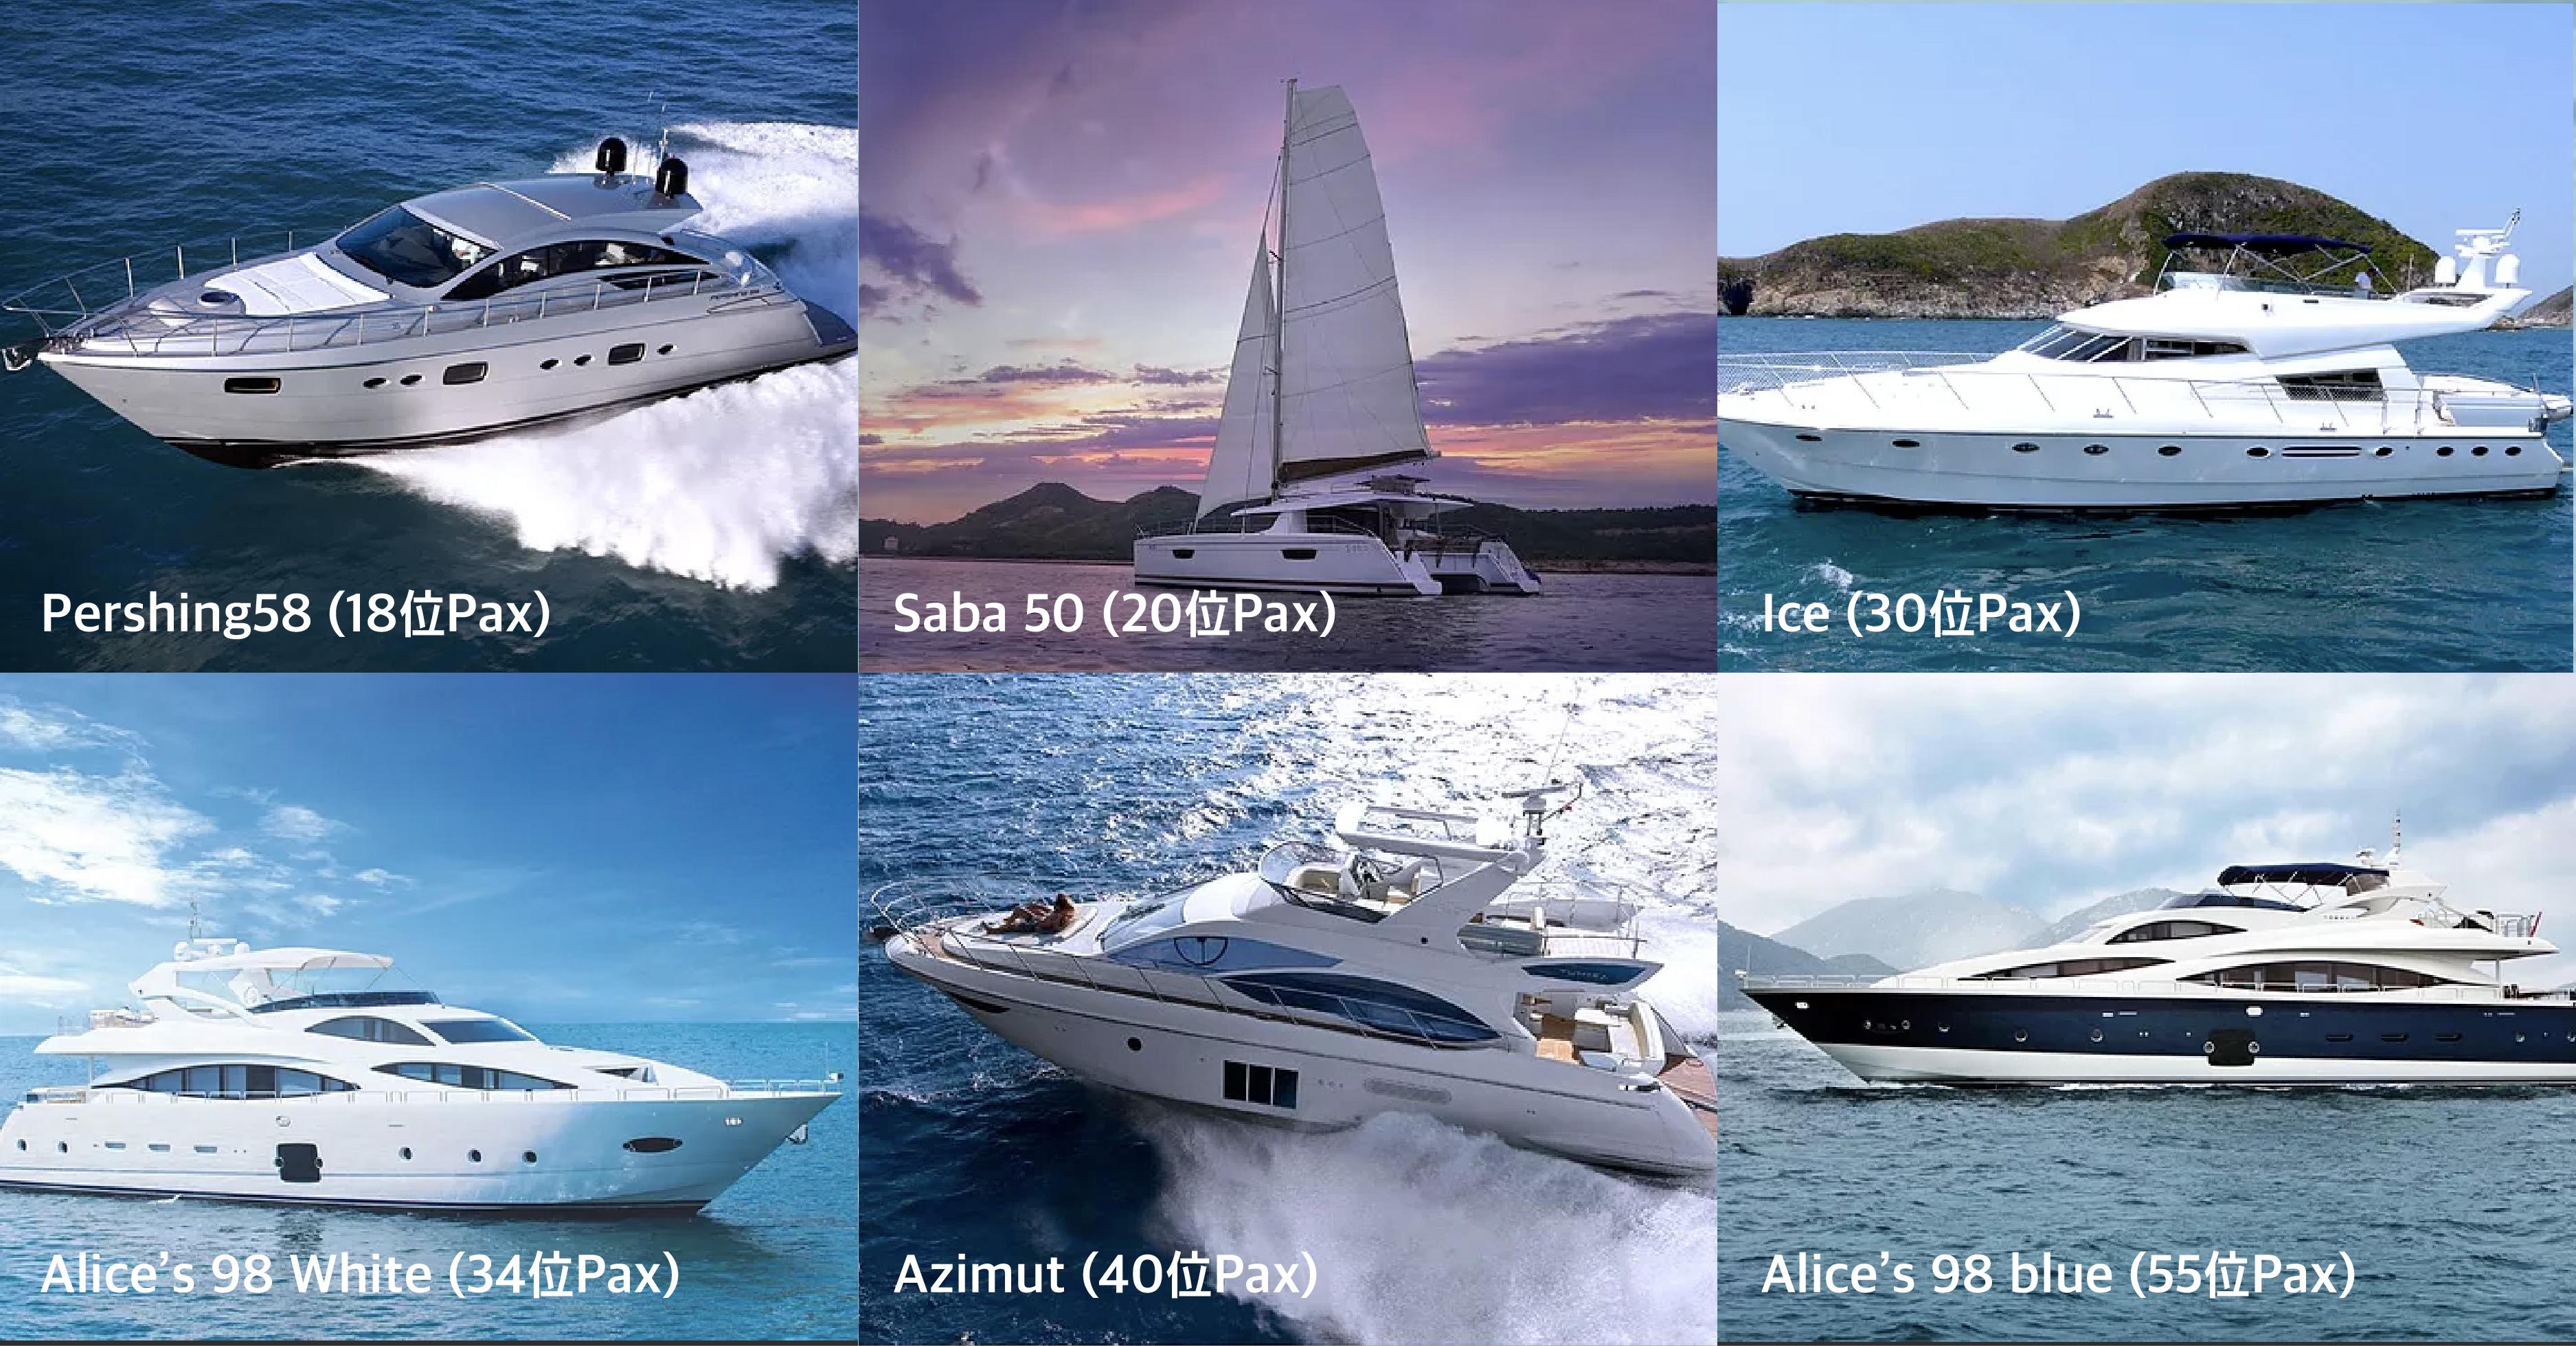 Pershing58 (18位Pax) Saba 50 (20位Pax) Ice (30位Pax) Alice's 98 White (34位Pax) Azimut (40位Pax) Alice's 98 blue (55位Pax),boat,yacht,passenger ship,water transportation,motorboat